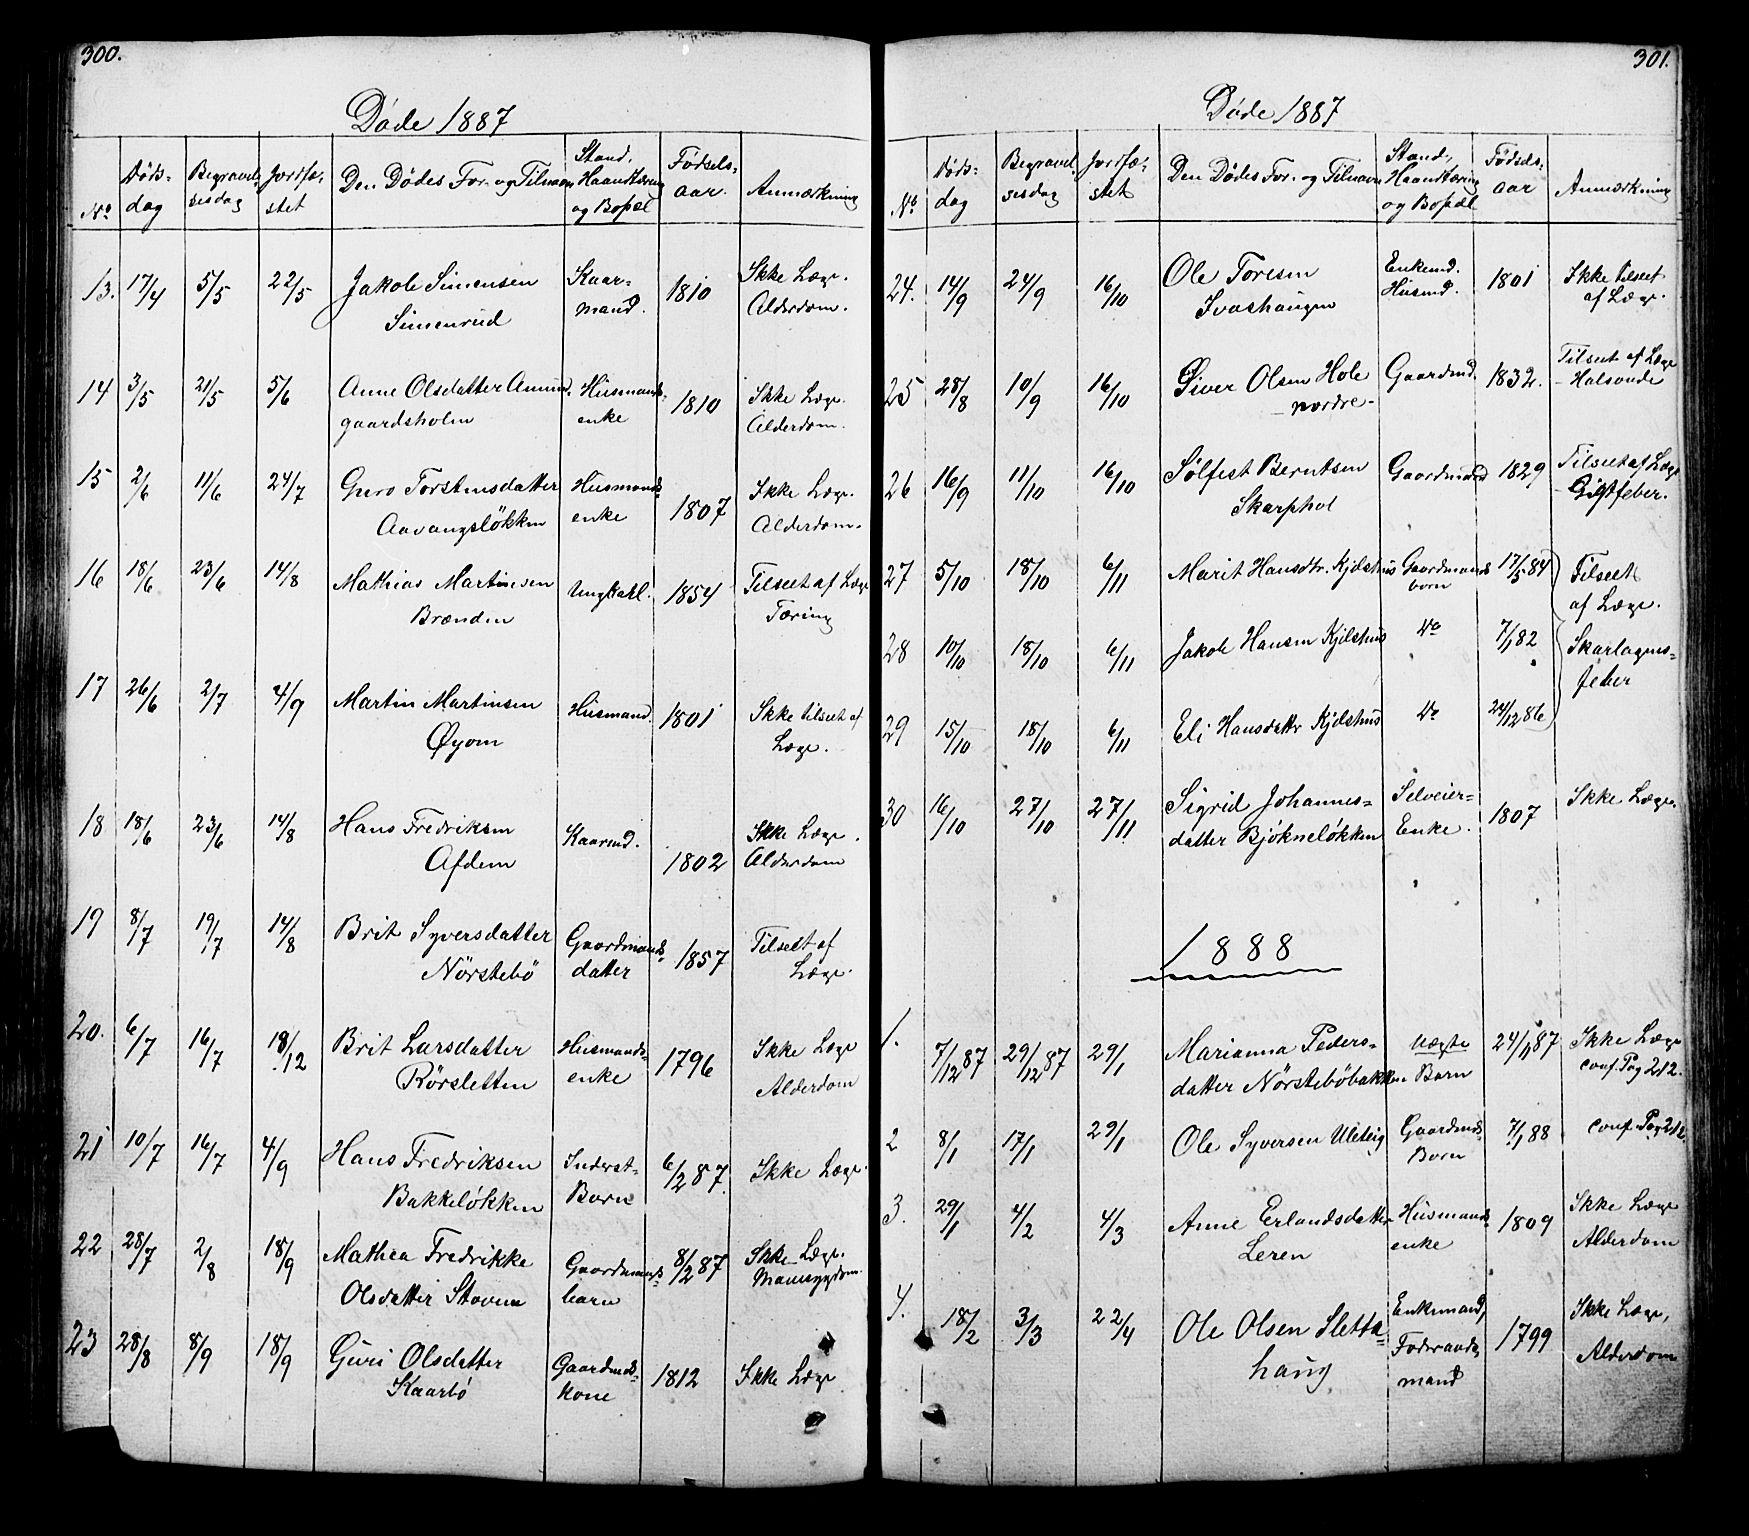 SAH, Lesja prestekontor, Klokkerbok nr. 5, 1850-1894, s. 300-301